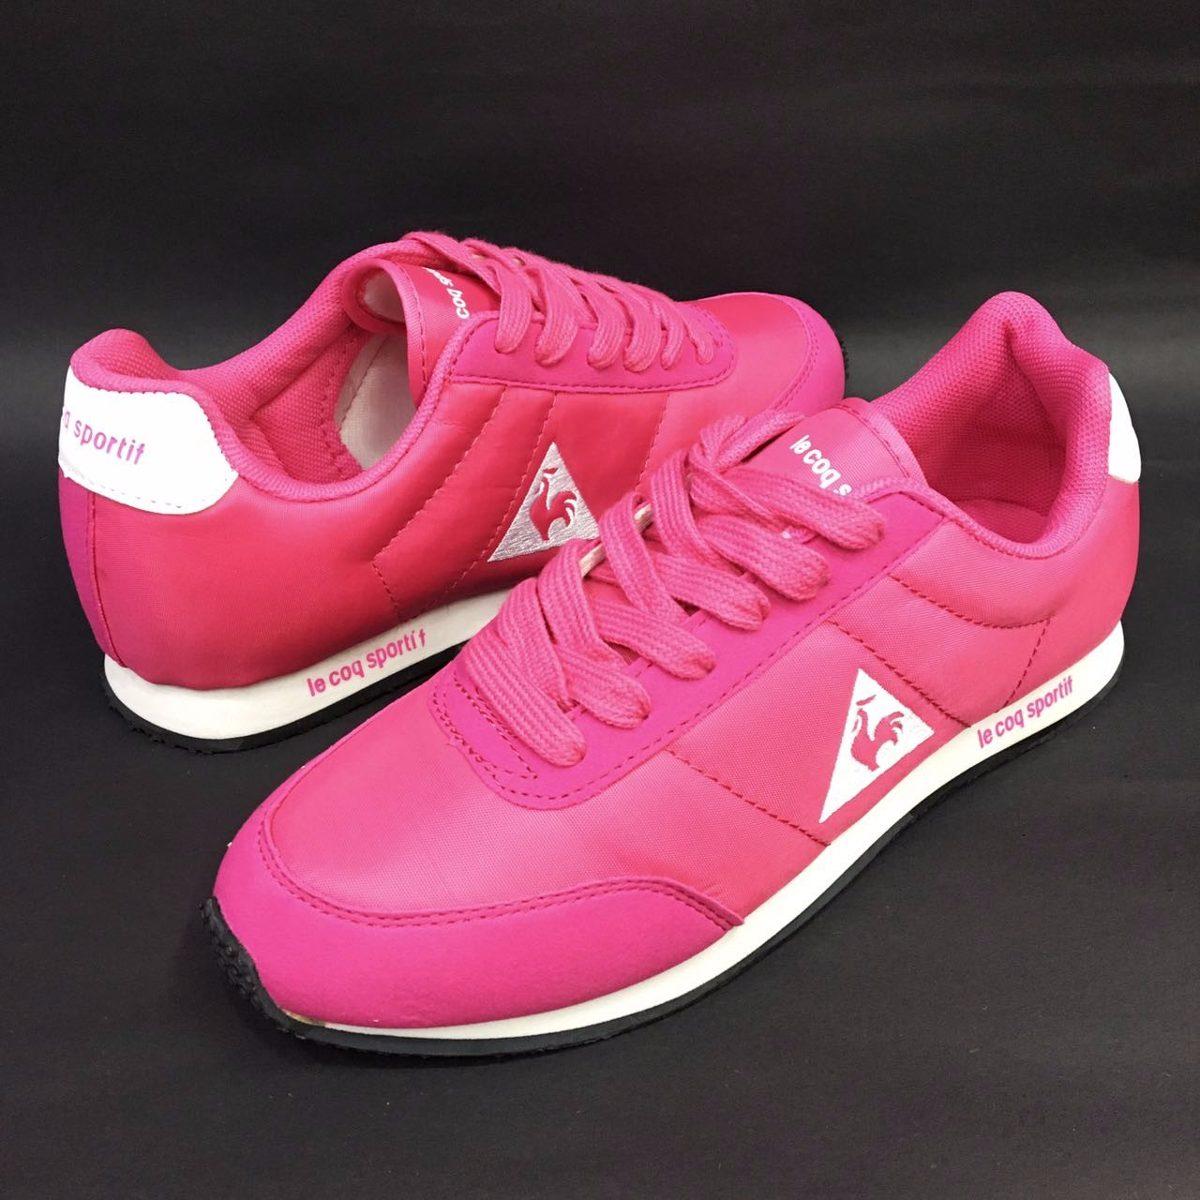 Reebok F/s Hi Satin Bow  39 EU Zapatos Le Coq Sportif para mujer dV9EHz